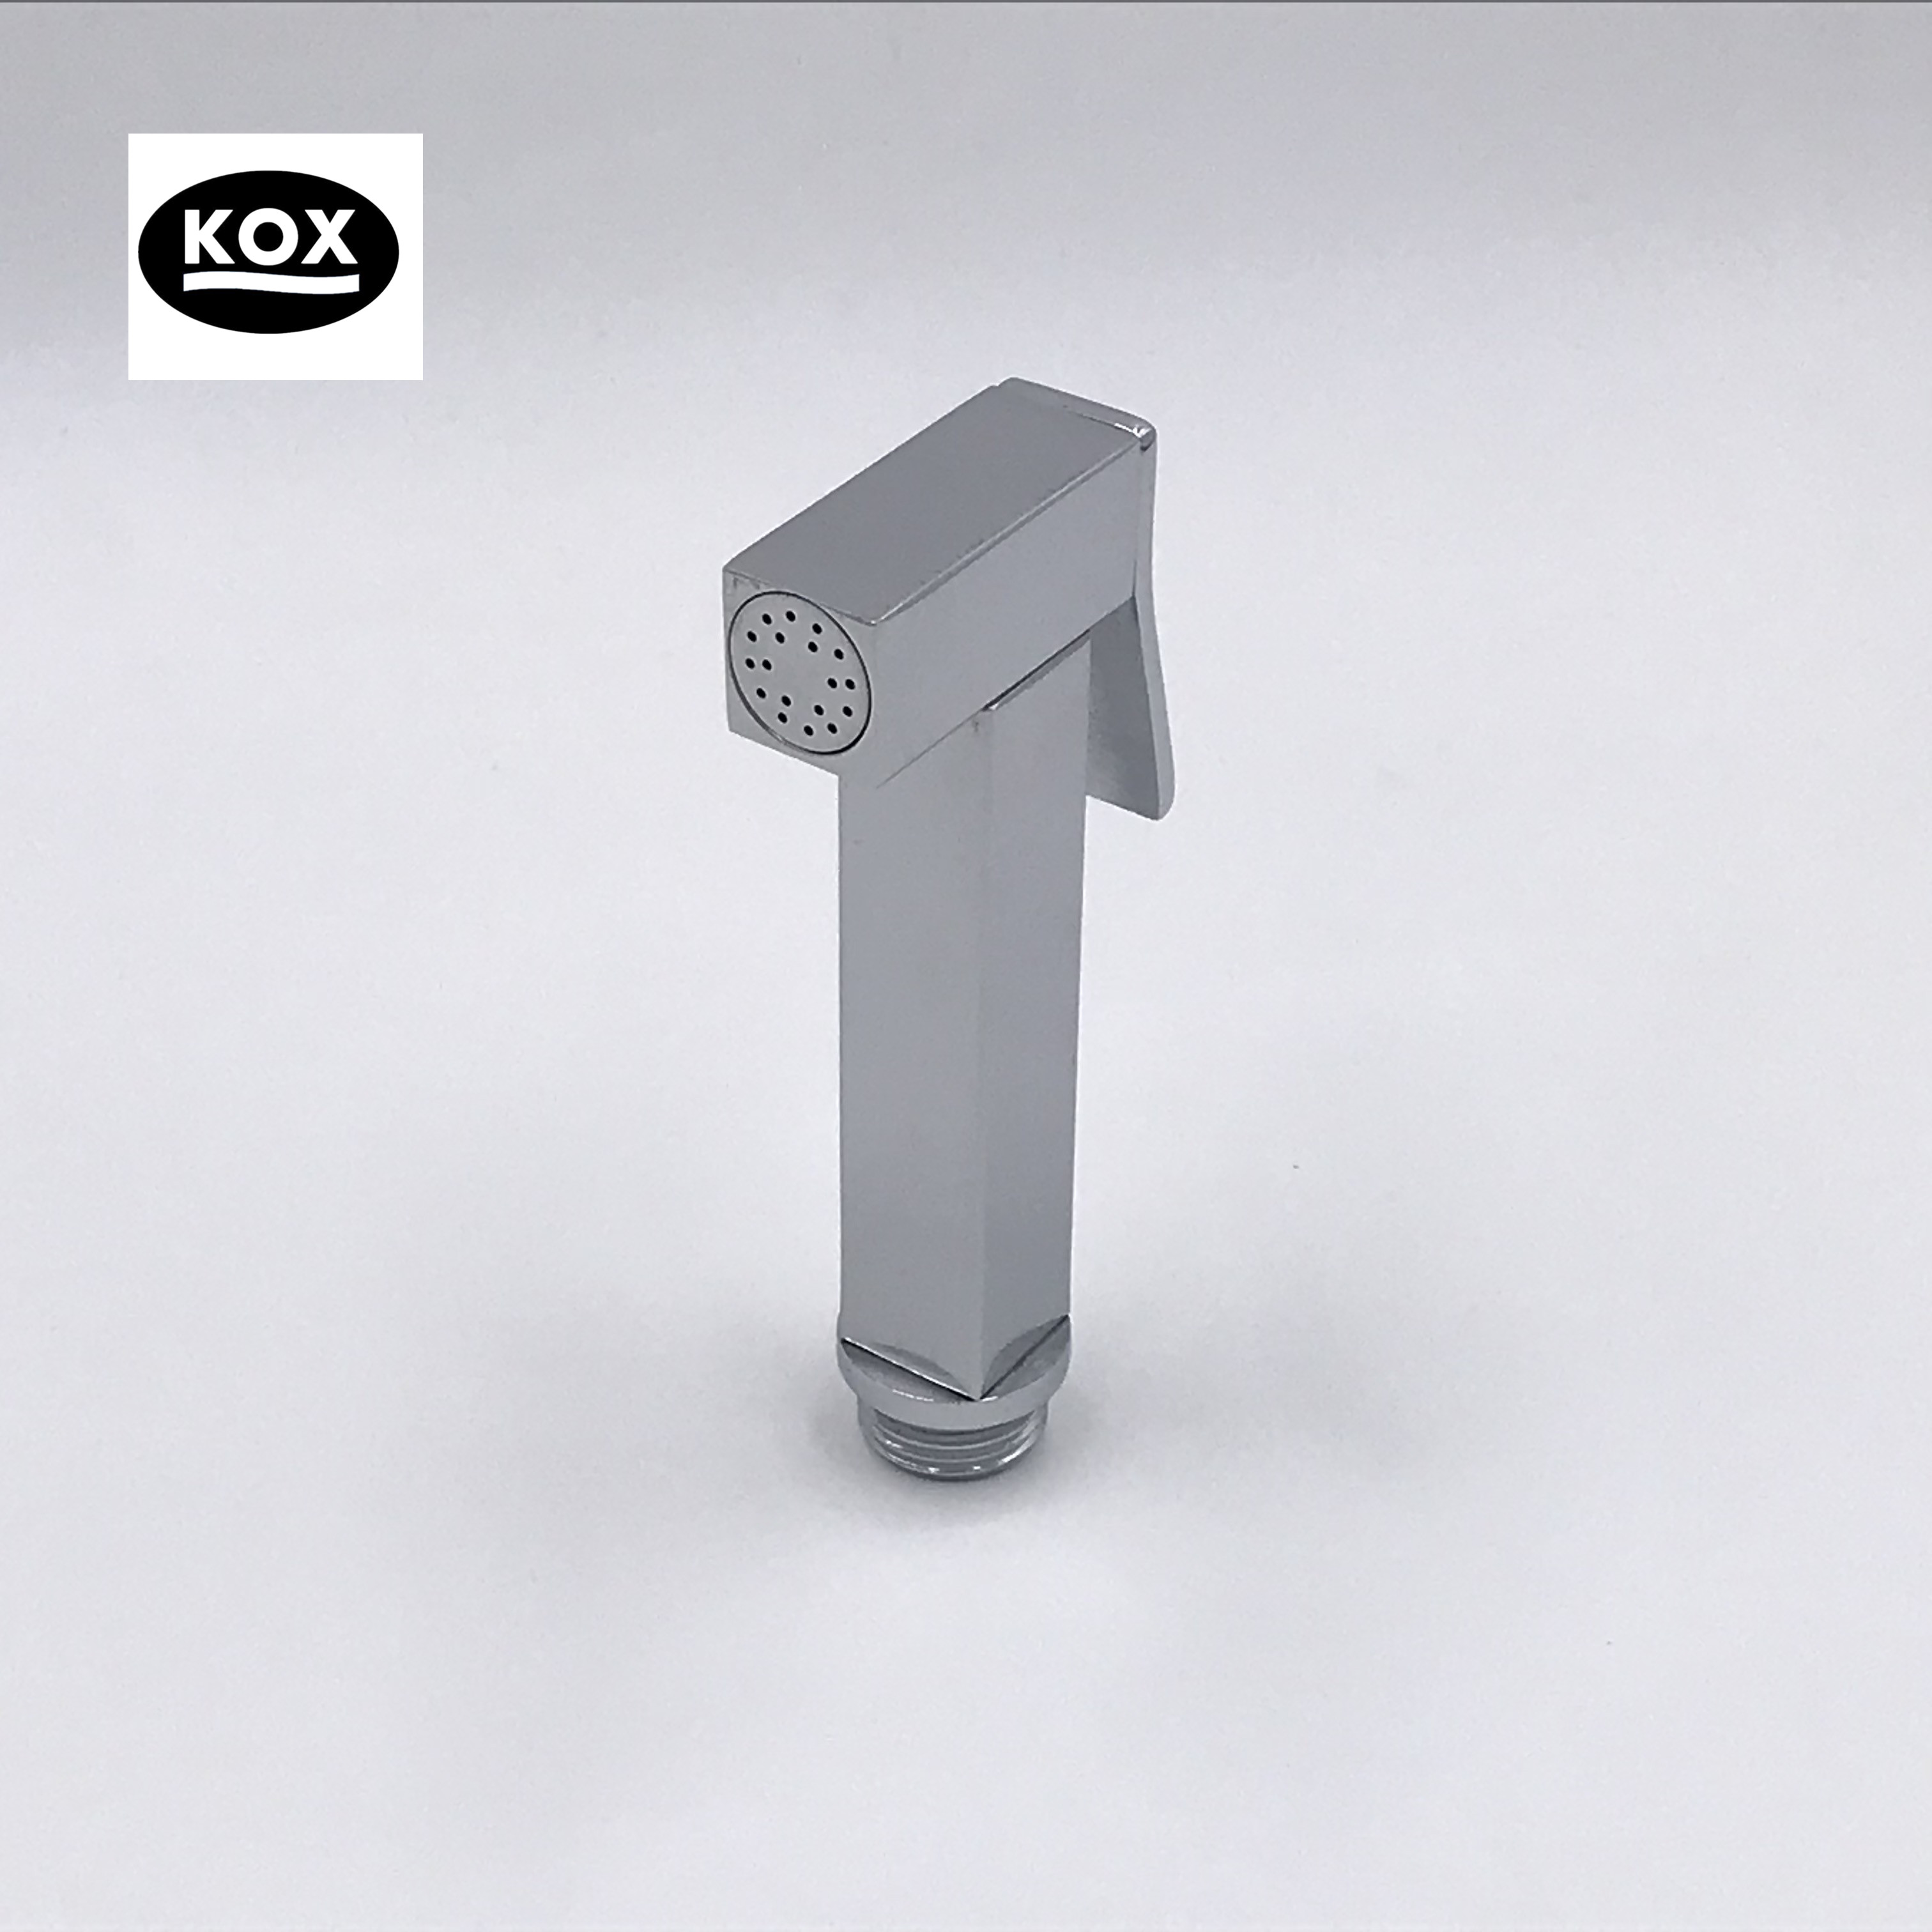 Brass Bathroom Bidet Sprayer Kit Hand Held Bidet Sprayer Buy Hand Held Bidet Sprayer Bidet Sprayer Kit Bathroom Bidet Sprayer Kit Product On Alibaba Com